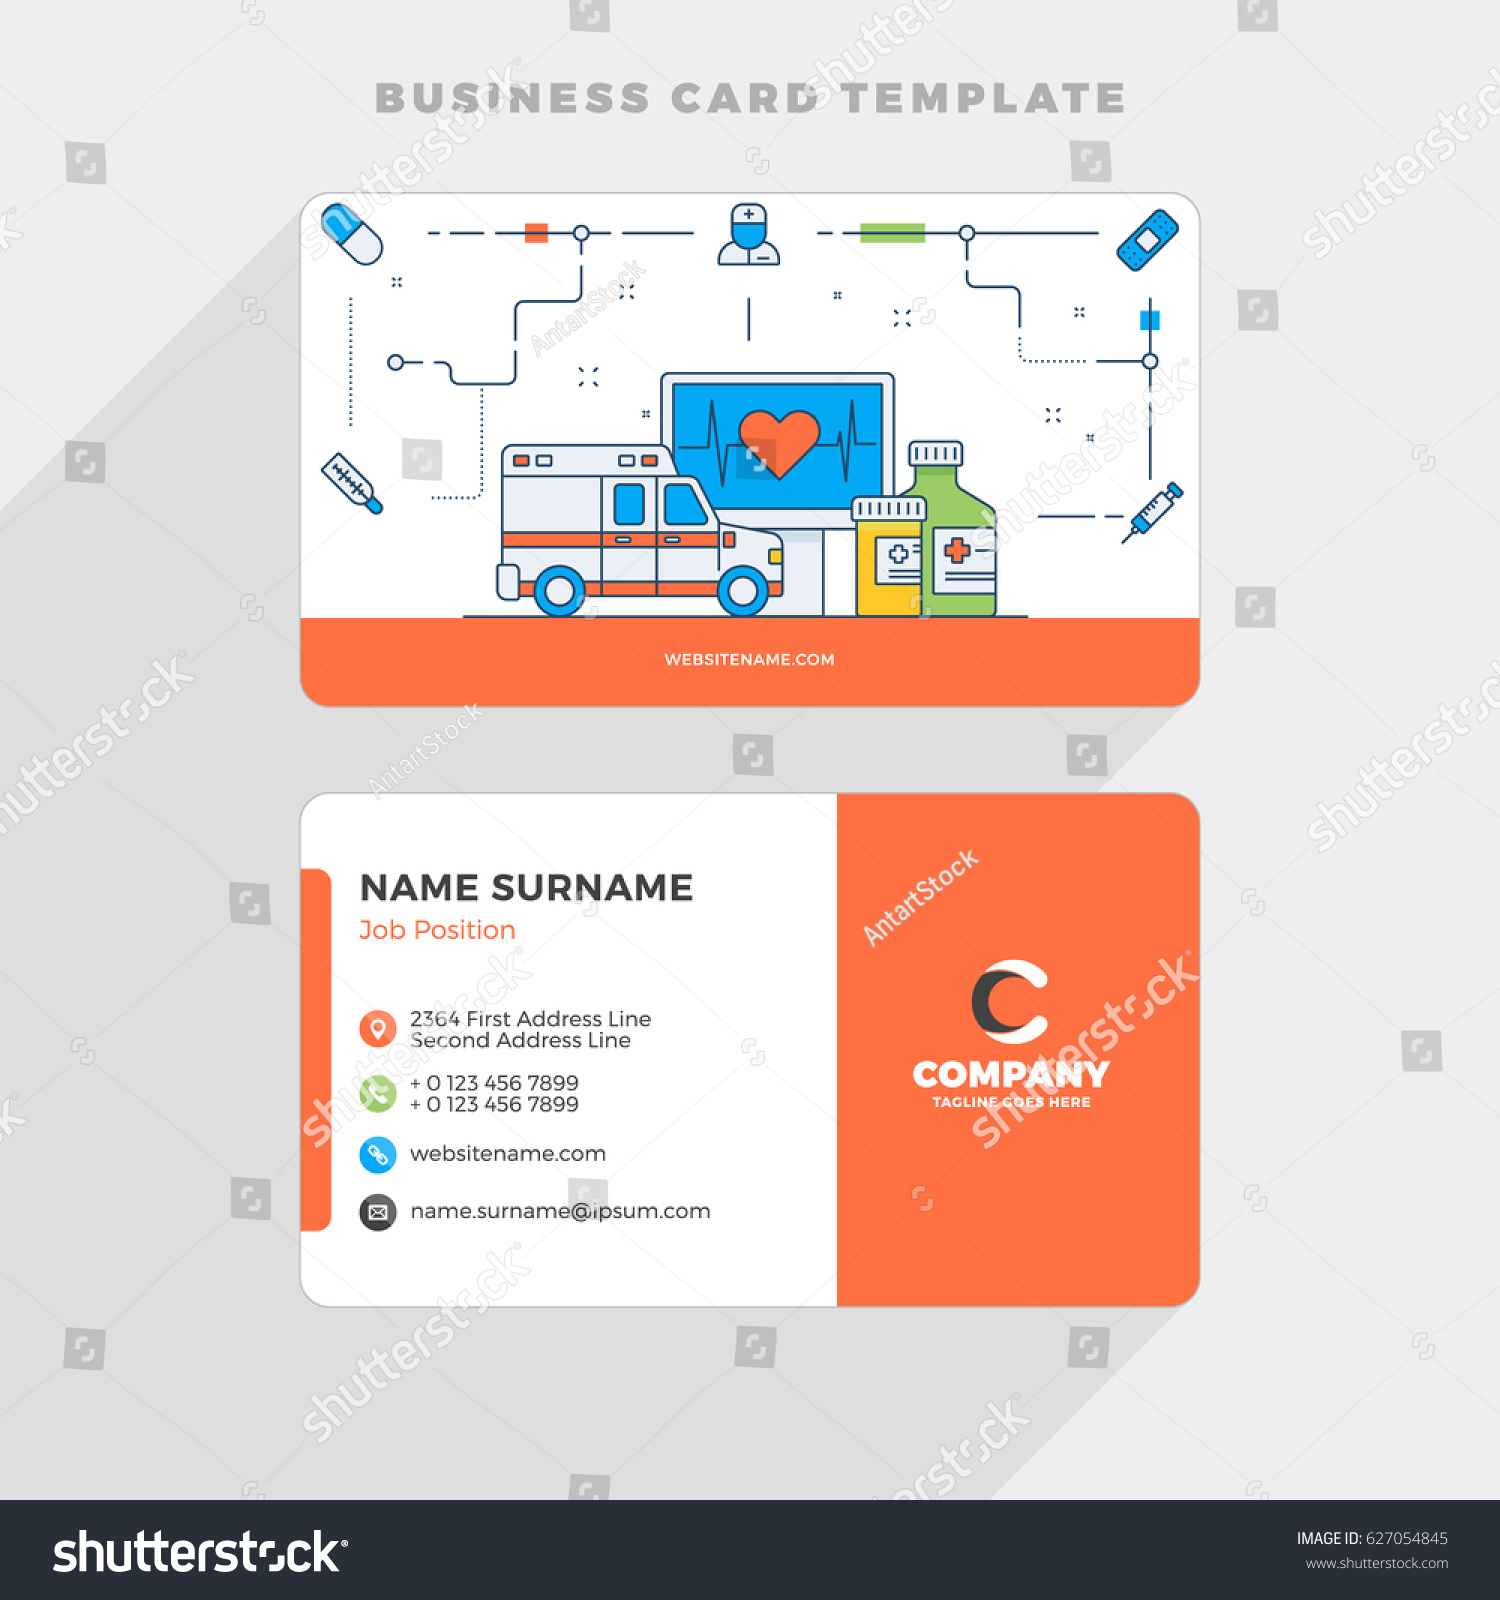 Creative business card template flat line stock vector 2018 creative business card template with flat line illustration healthcare vector illustration stationery design reheart Images